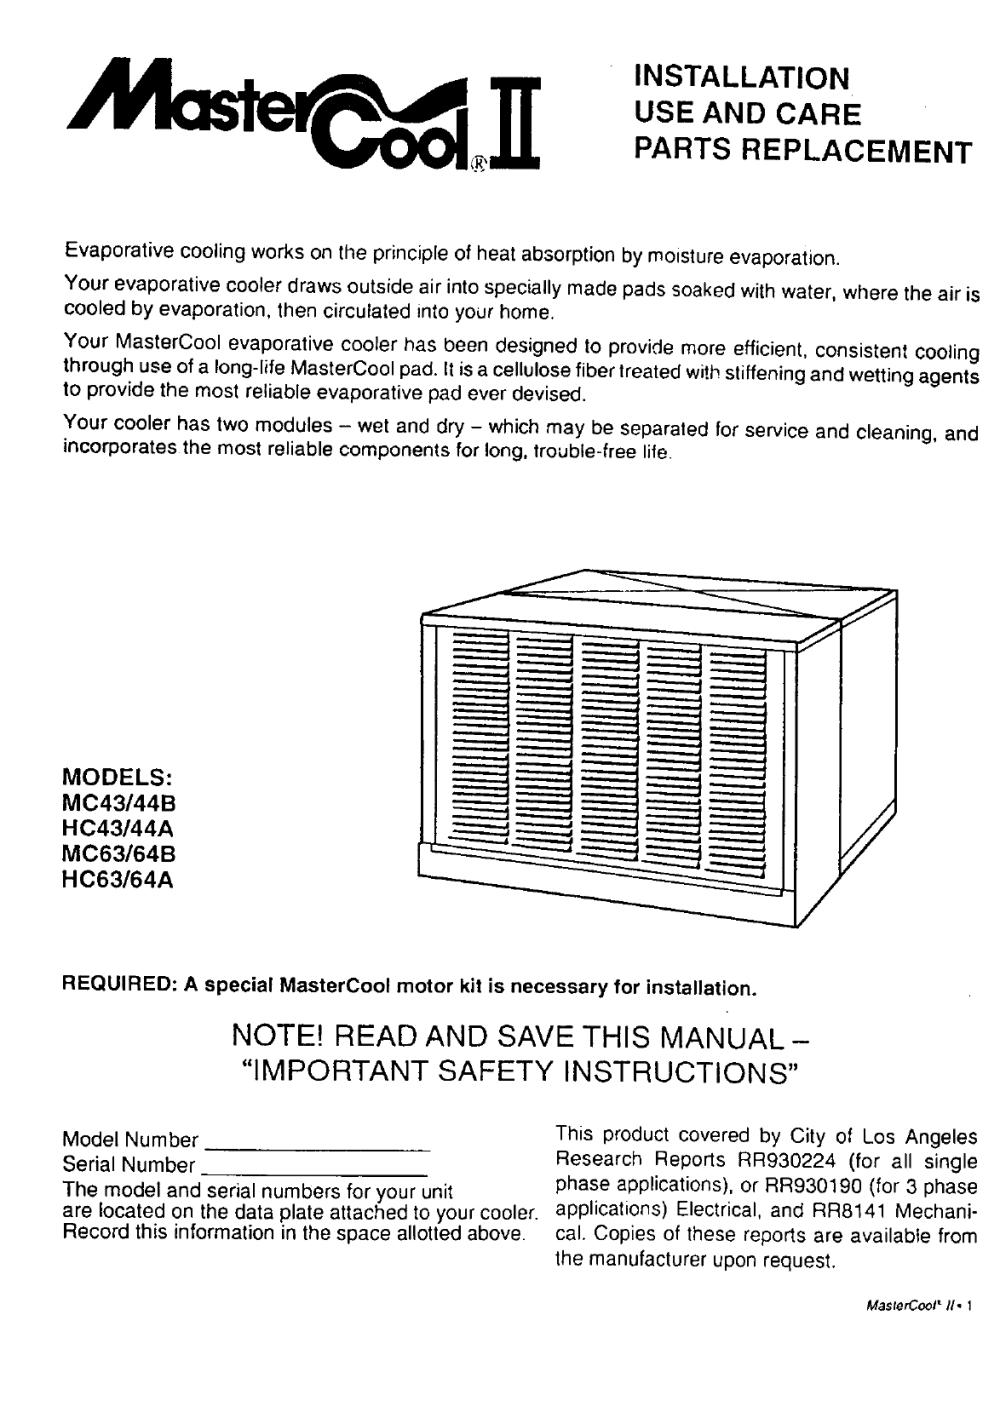 medium resolution of  mastercool programmable thermostat adobeair evaporative cooler manual l9070130 on mastercool side draft diagram mastercool programmable thermostat